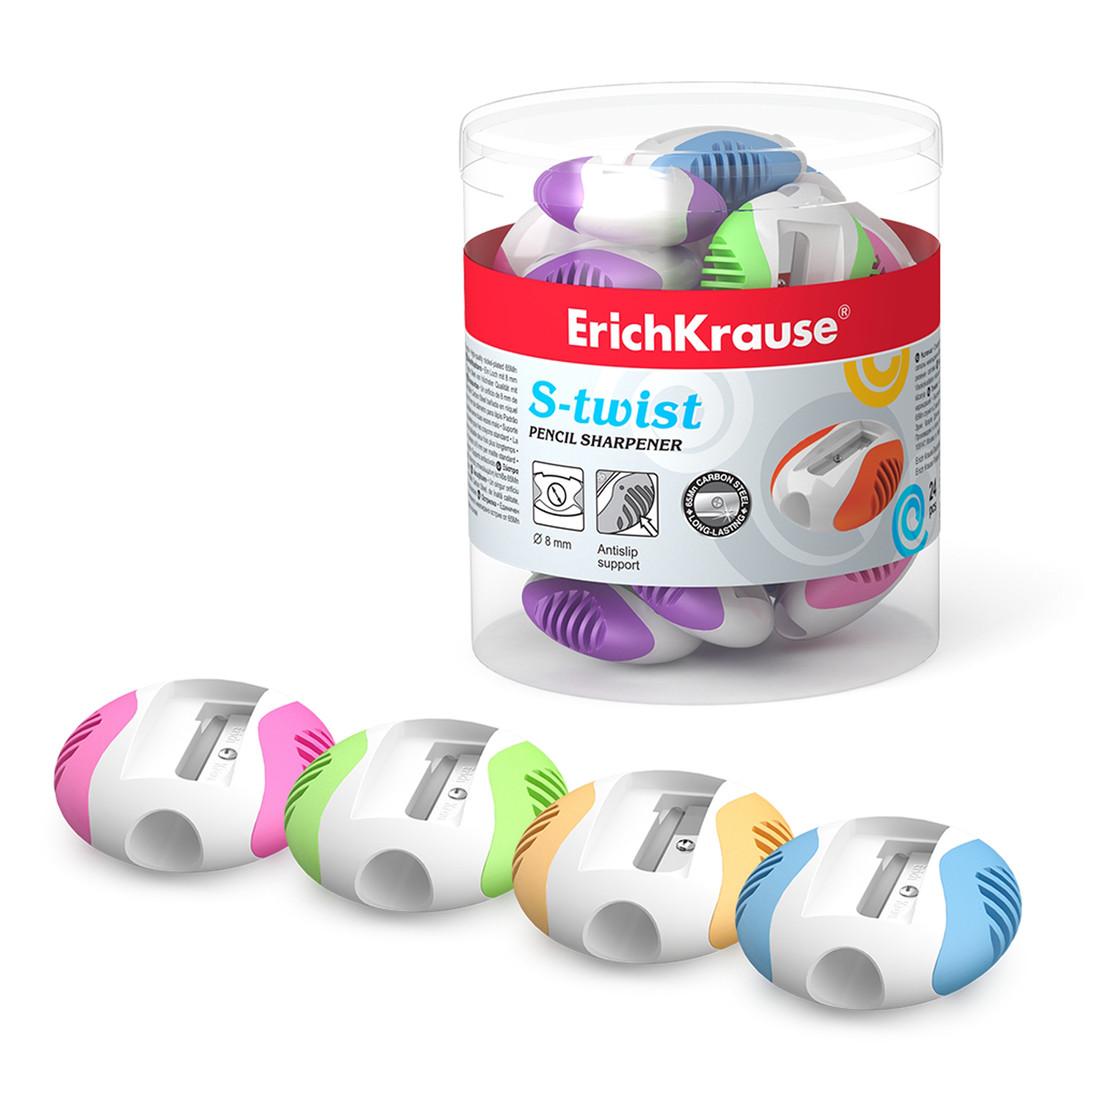 Пластиковая точилка ErichKrause® 33613 S-Twist цвет корпуса ассорти (в тубусе по 24 шт.)